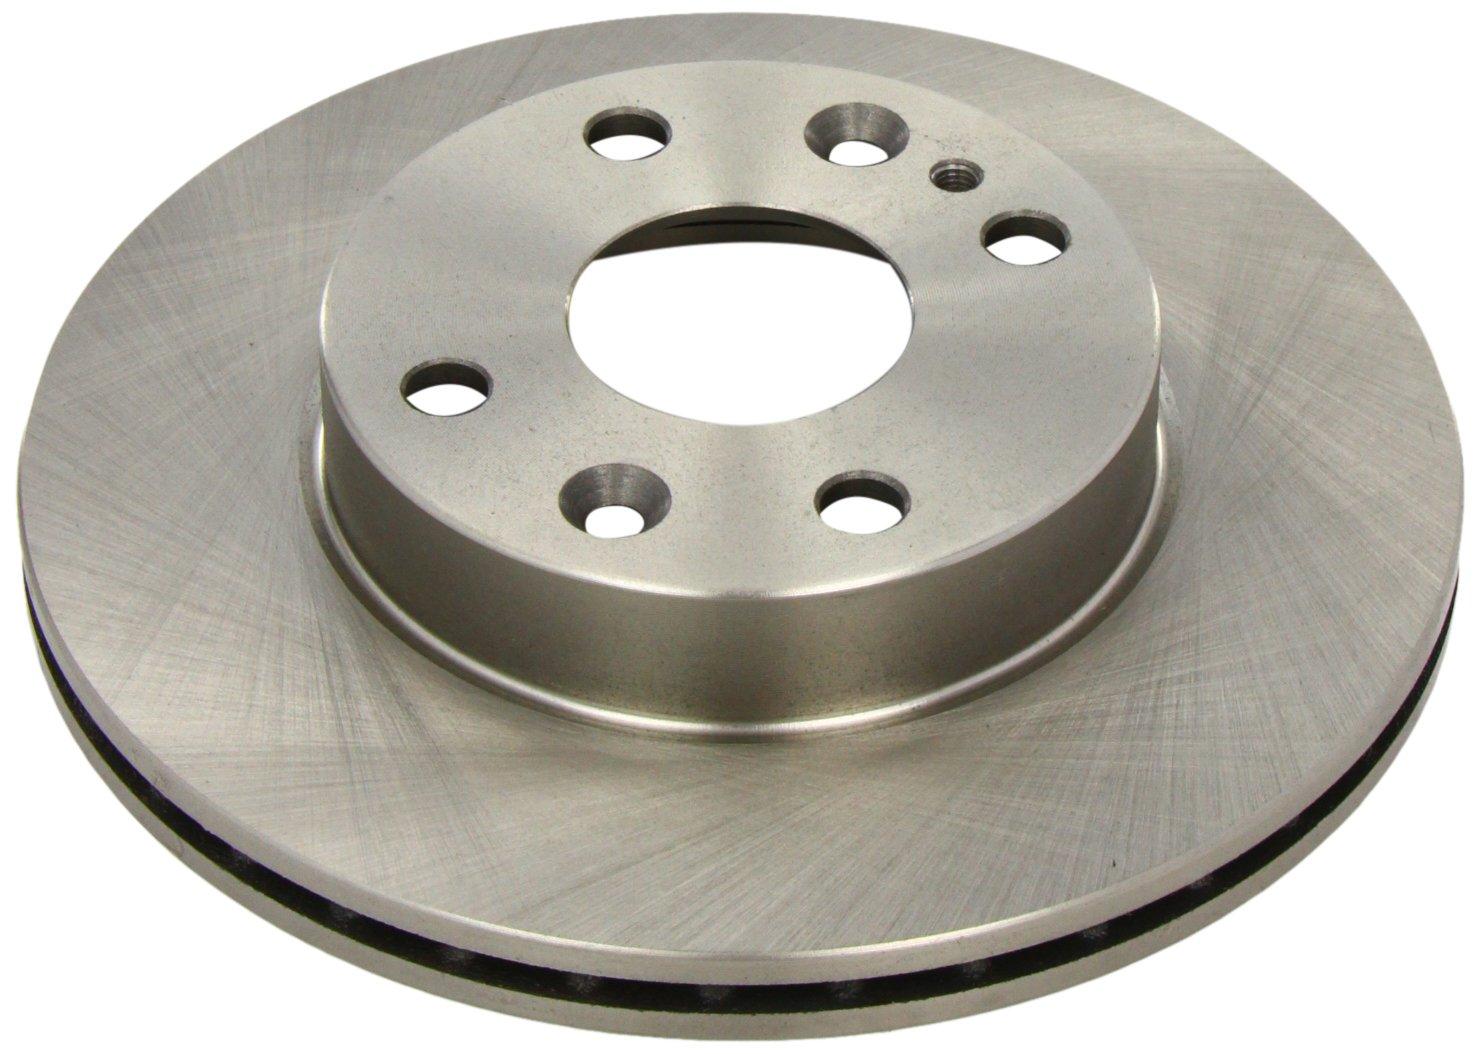 ABS 15946 Brake Discs - (Box contains 2 discs) ABS All Brake Systems bv